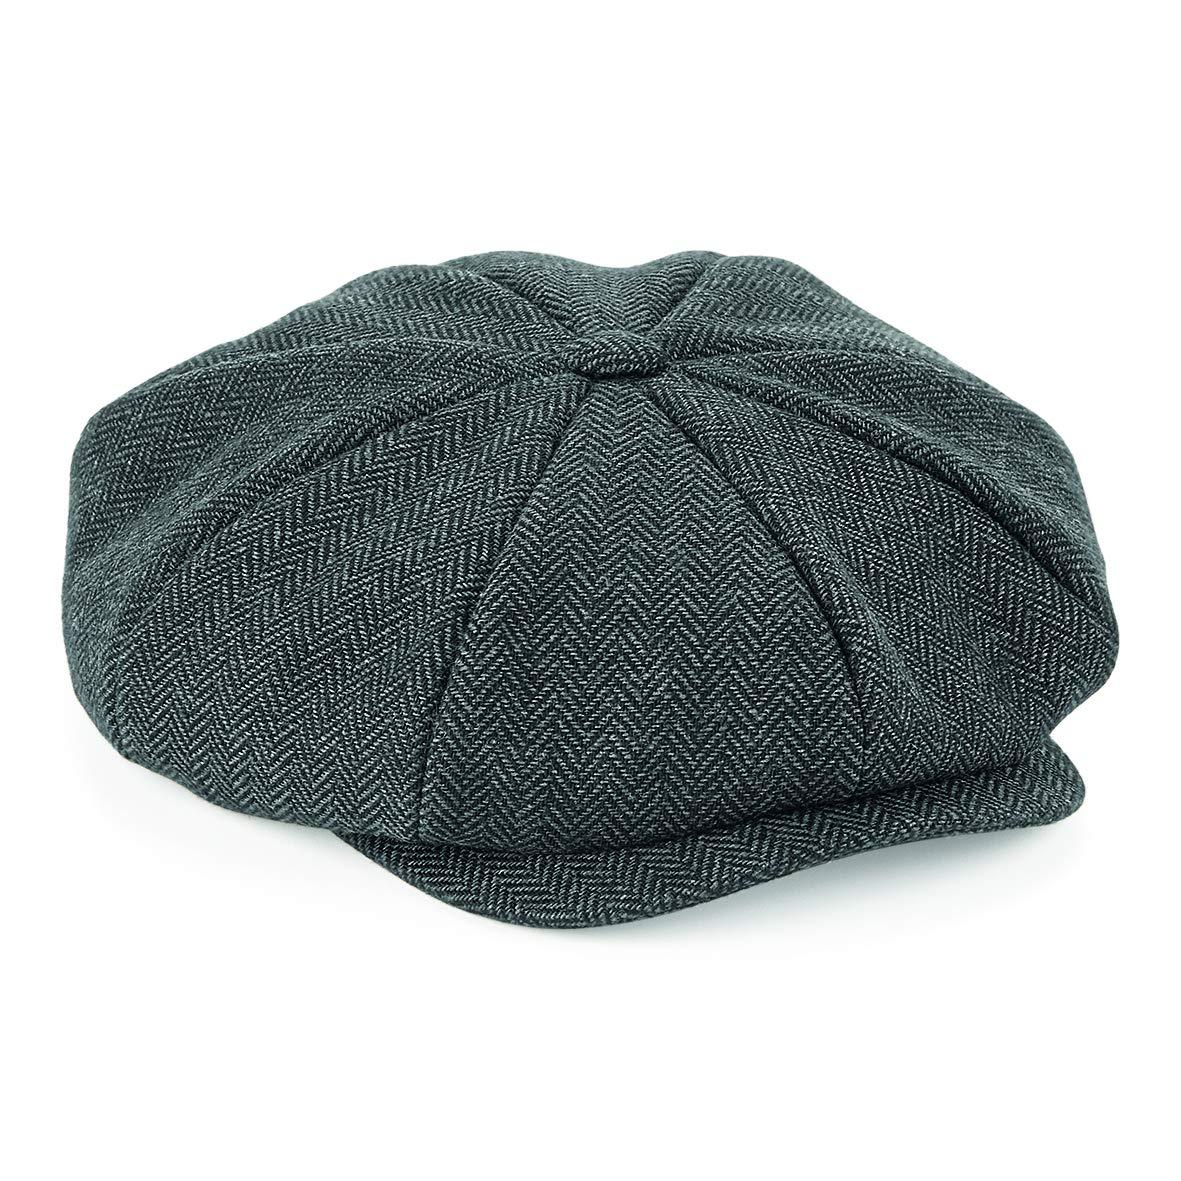 ASVP Shop 'Shelby' Newsboy Herringbone Cloth Cap Blinder Peaky Hat